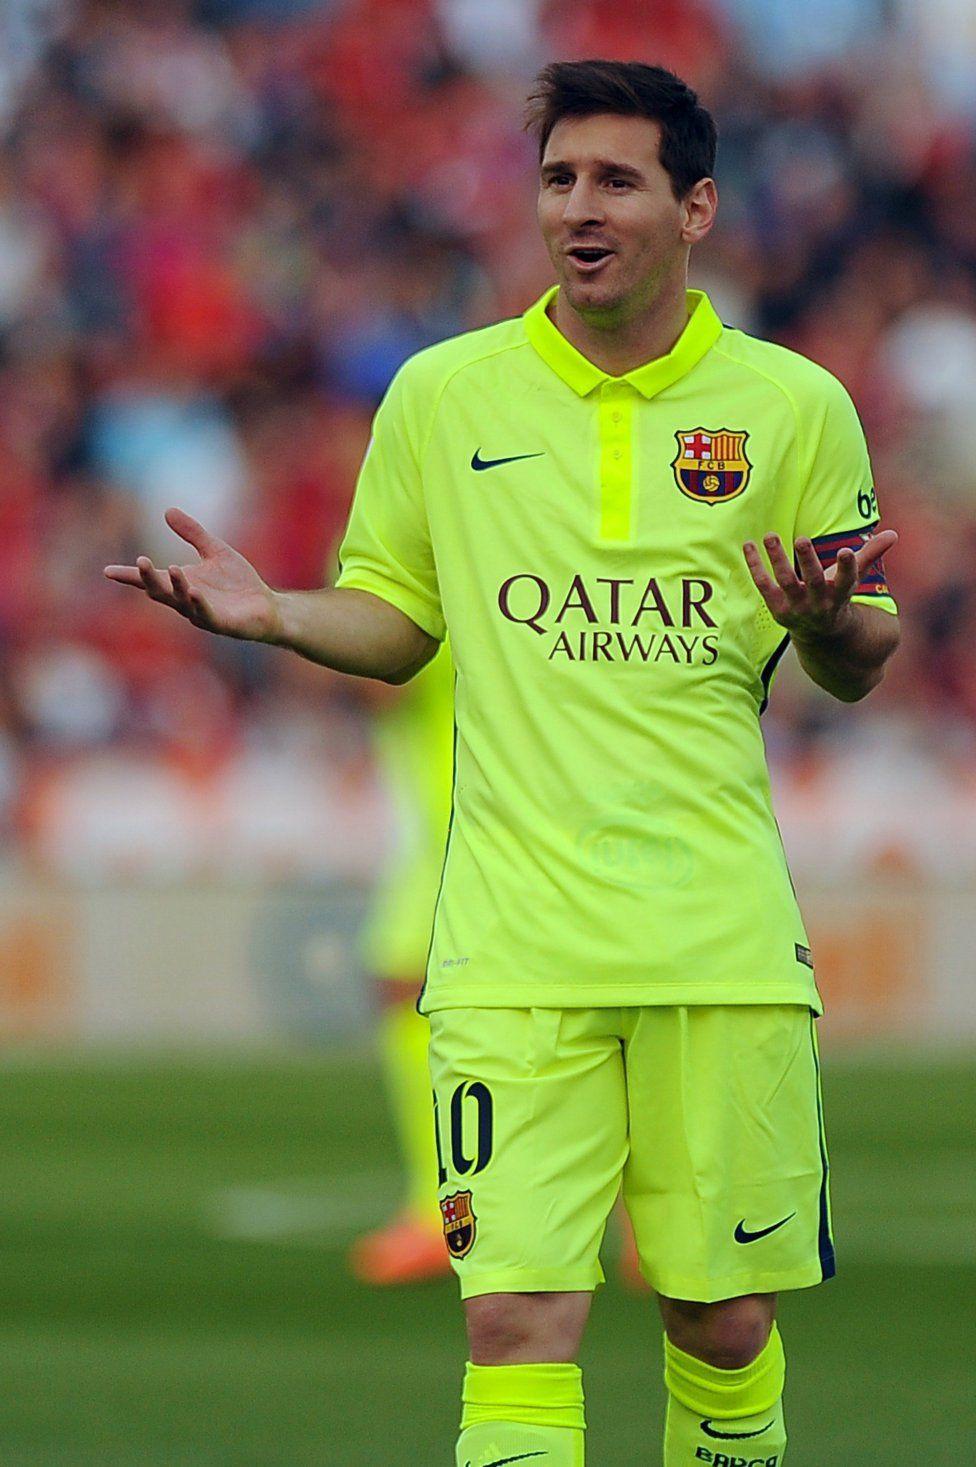 Las Imagenes Del Almeria Barcelona Fotogaleria Album As Com Lionel Messi Messi Lionel Messi Barcelona